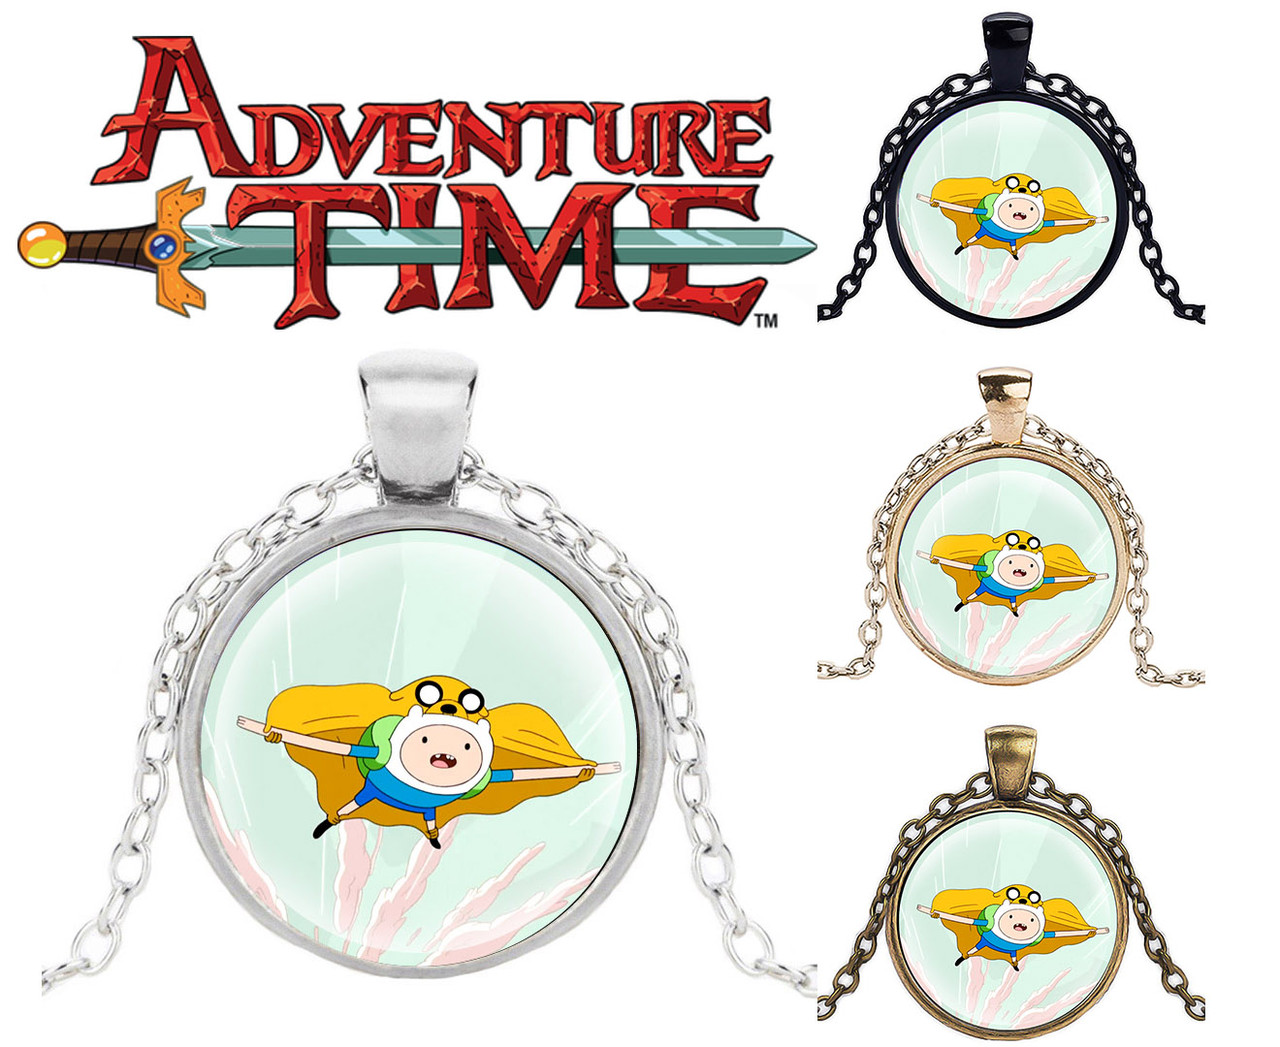 Кулон Adventure time Финн и Джейк Время приключений